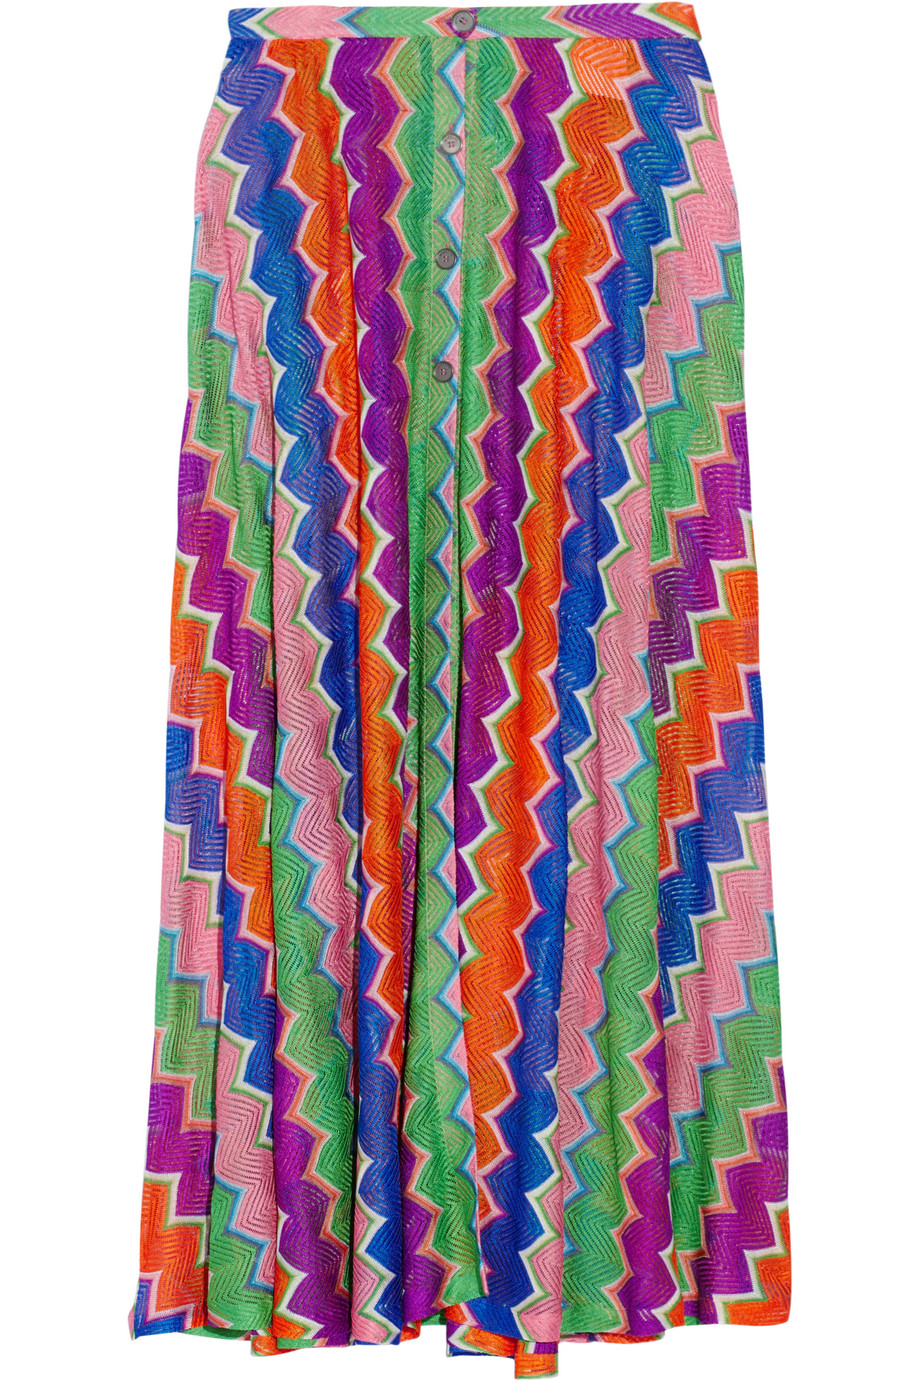 Missoni Mare Crochet-Knit Maxi Skirt, Dark Purple, Women's, Size: 46